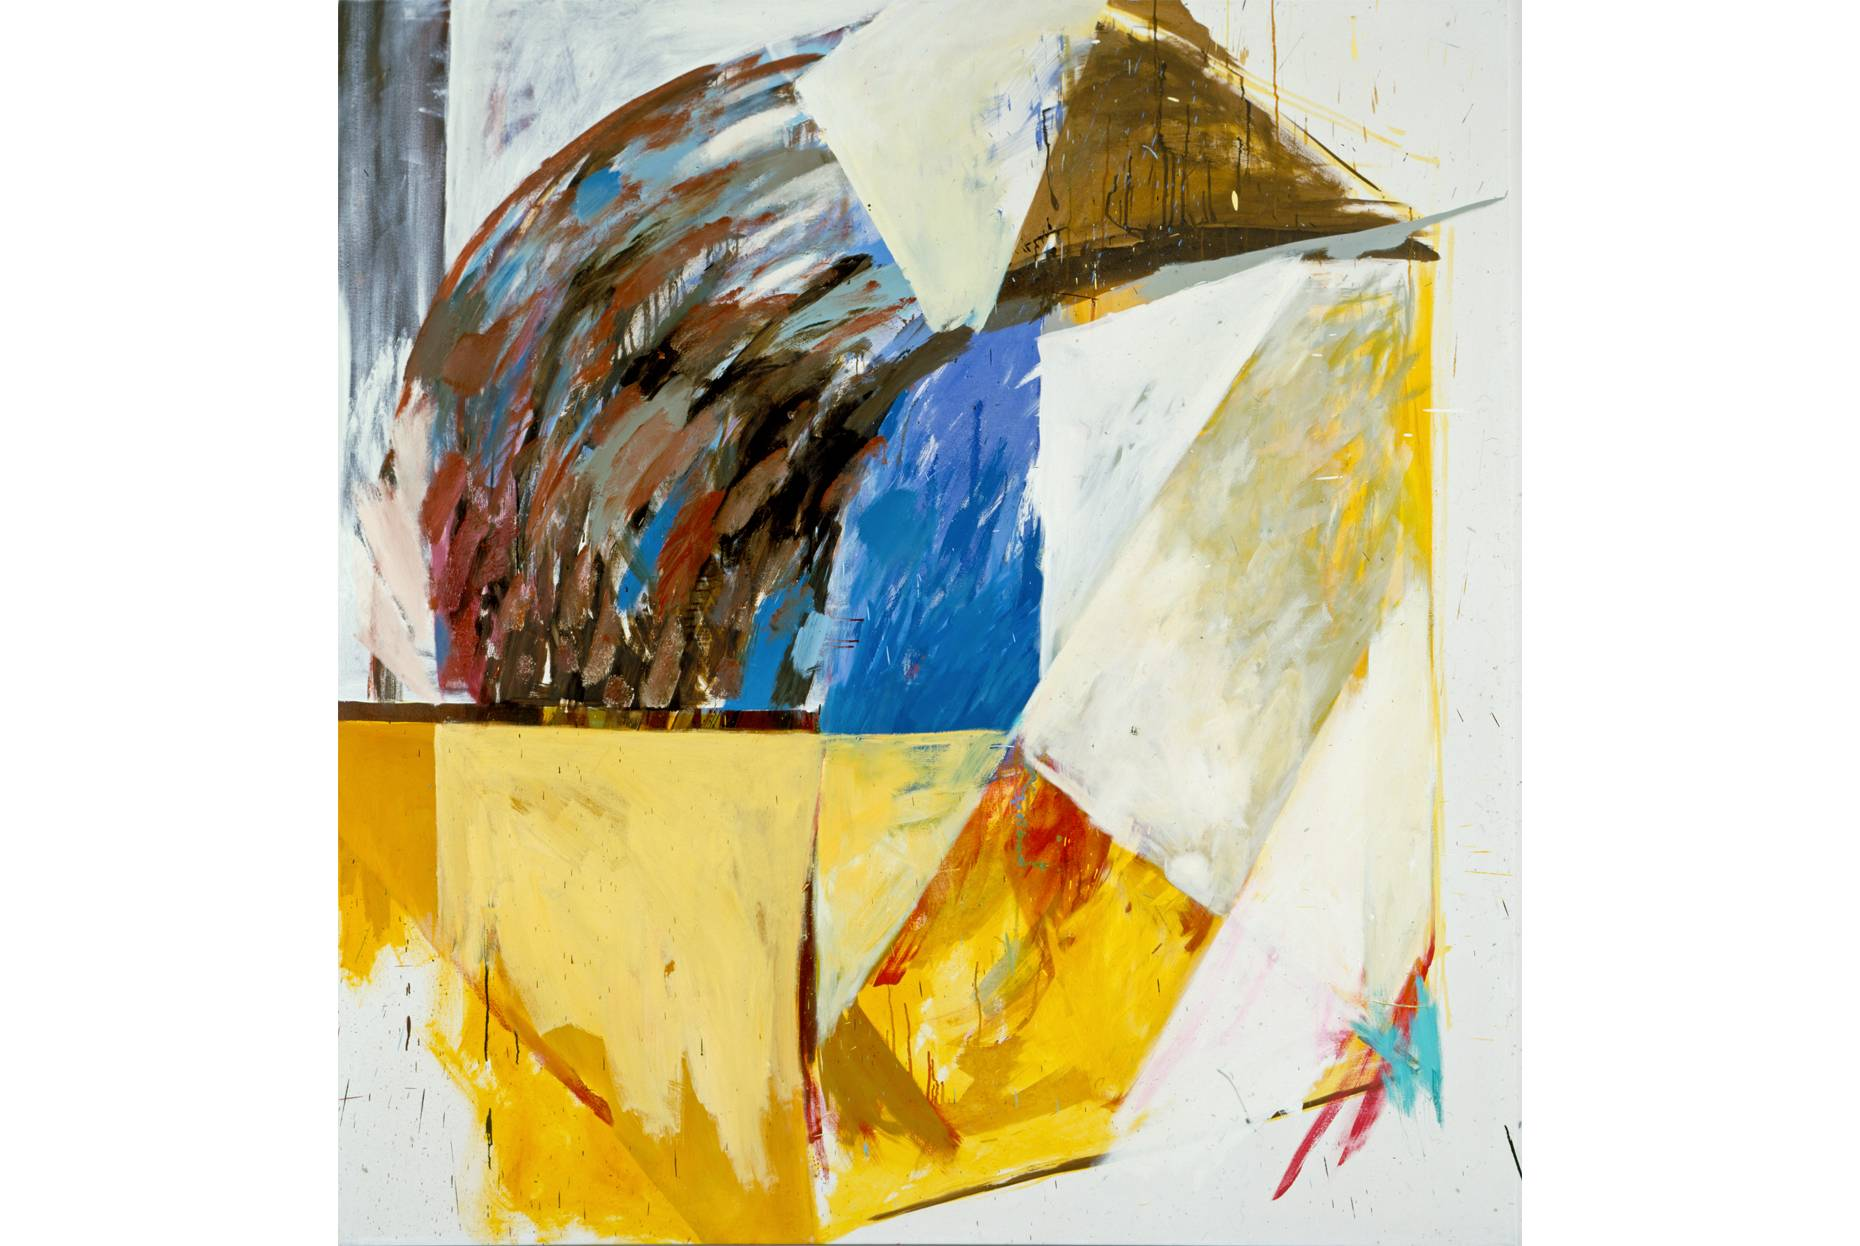 o.T. 1986 Pigment und Ölfarbe a/ Nessel 210 x 200 cm